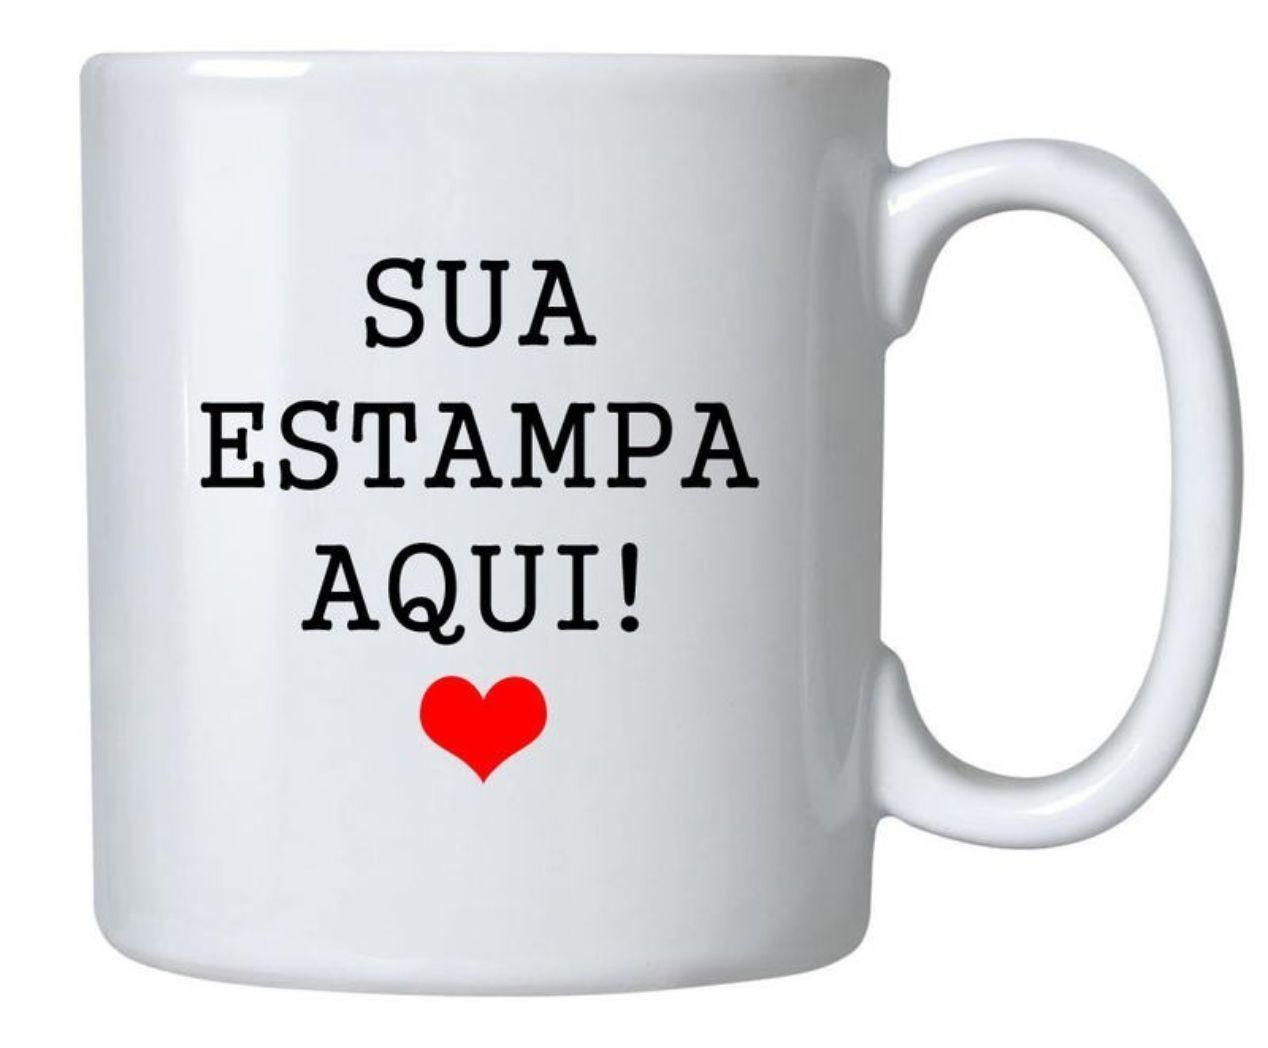 1 Caneca de Porcelana Personalizada + 1 Caixa de brinde.  - BRASIL BRINDES